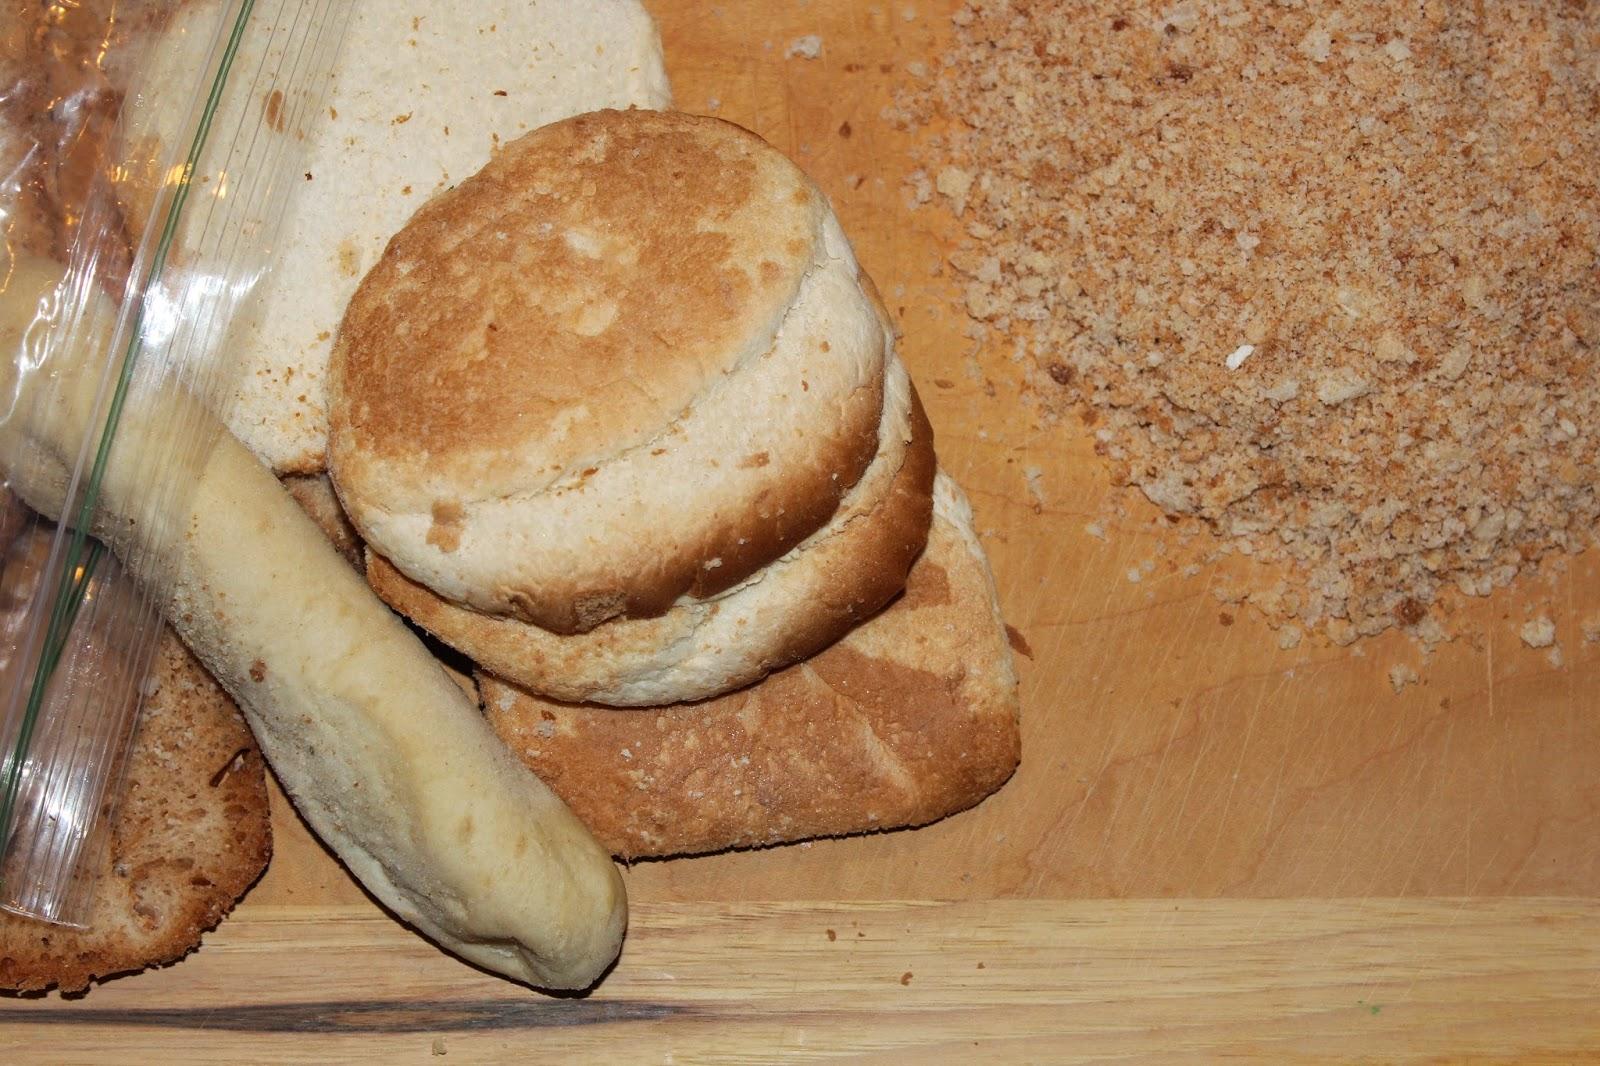 IMG 4482 - Homemade Breadcrumbs